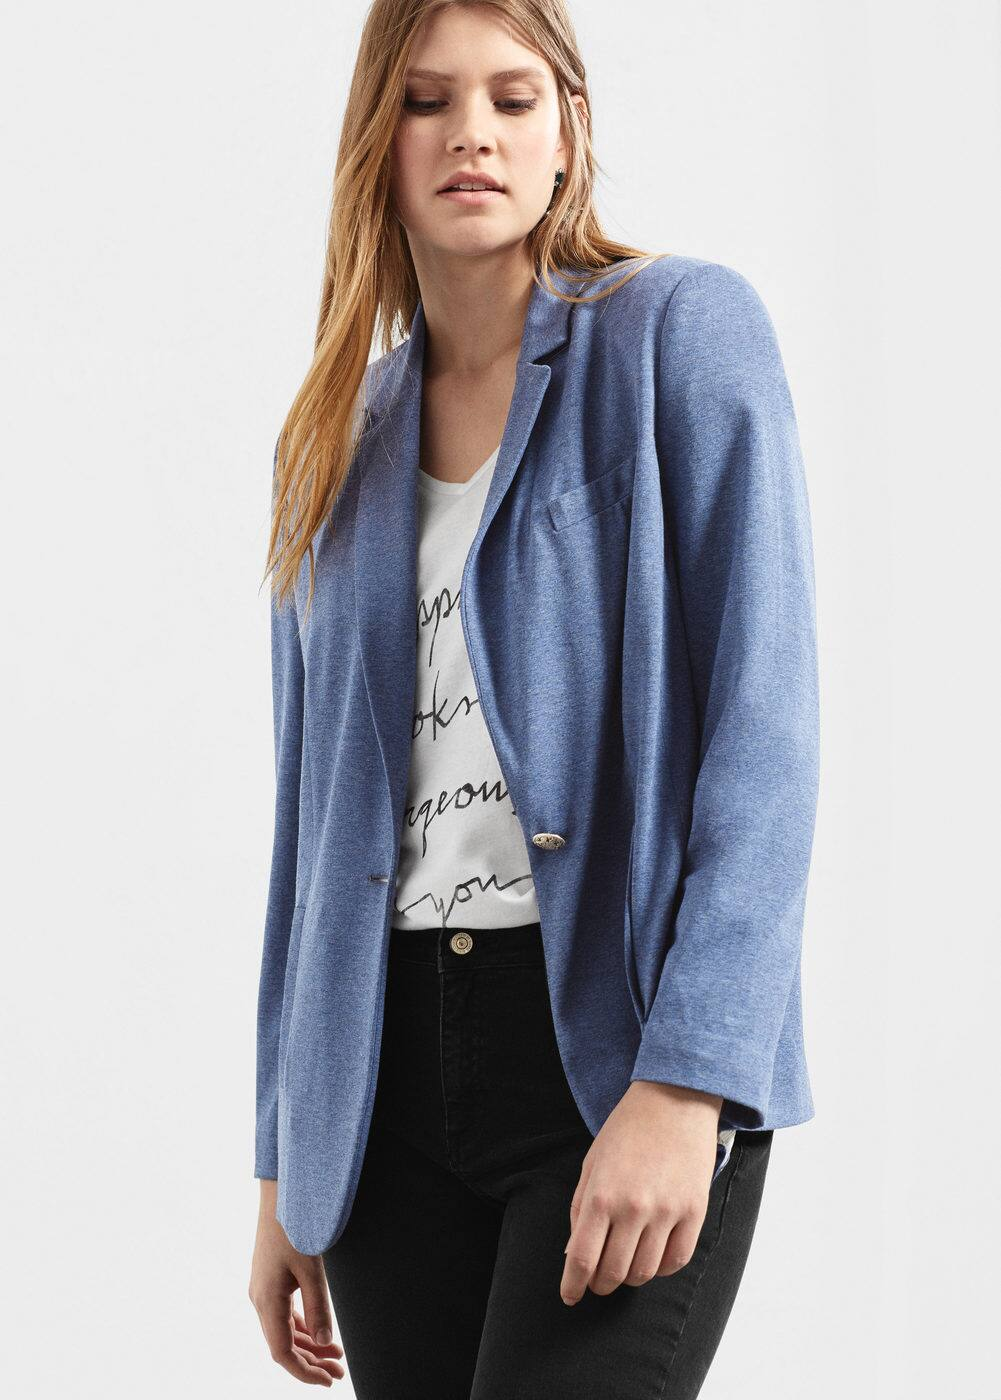 Flecked blazer | VIOLETA BY MANGO